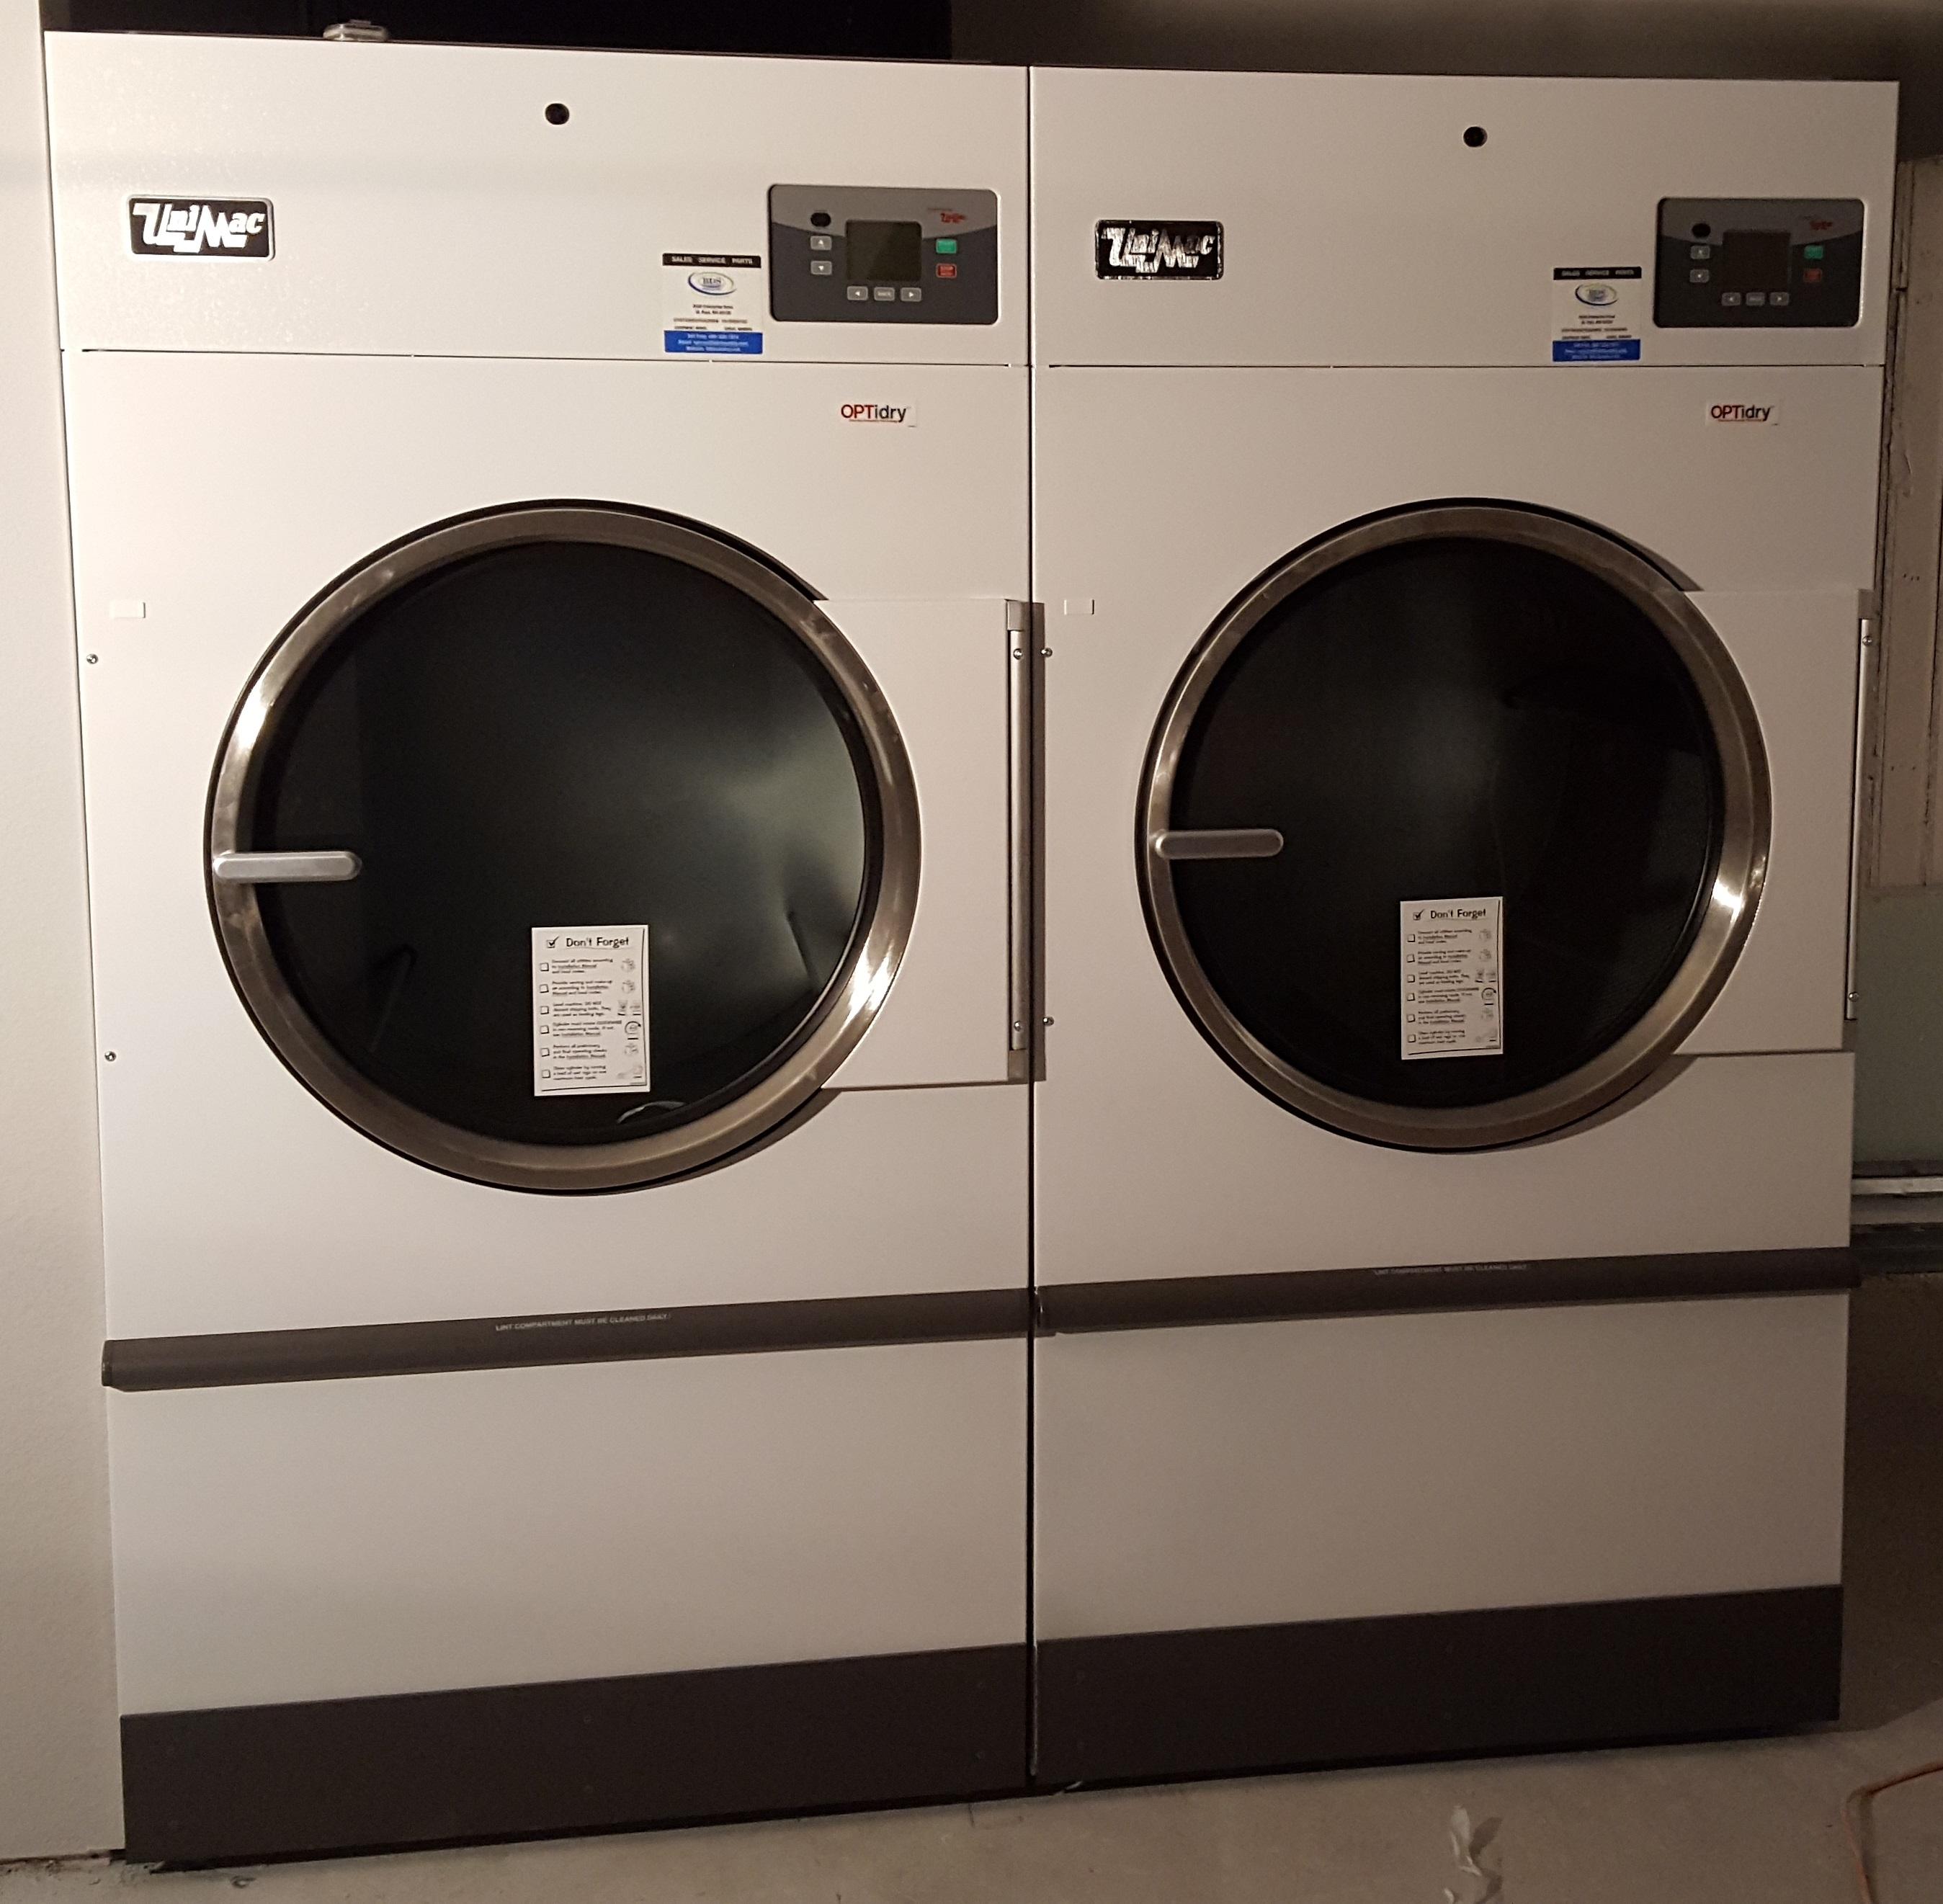 unimac-tumble-dryers